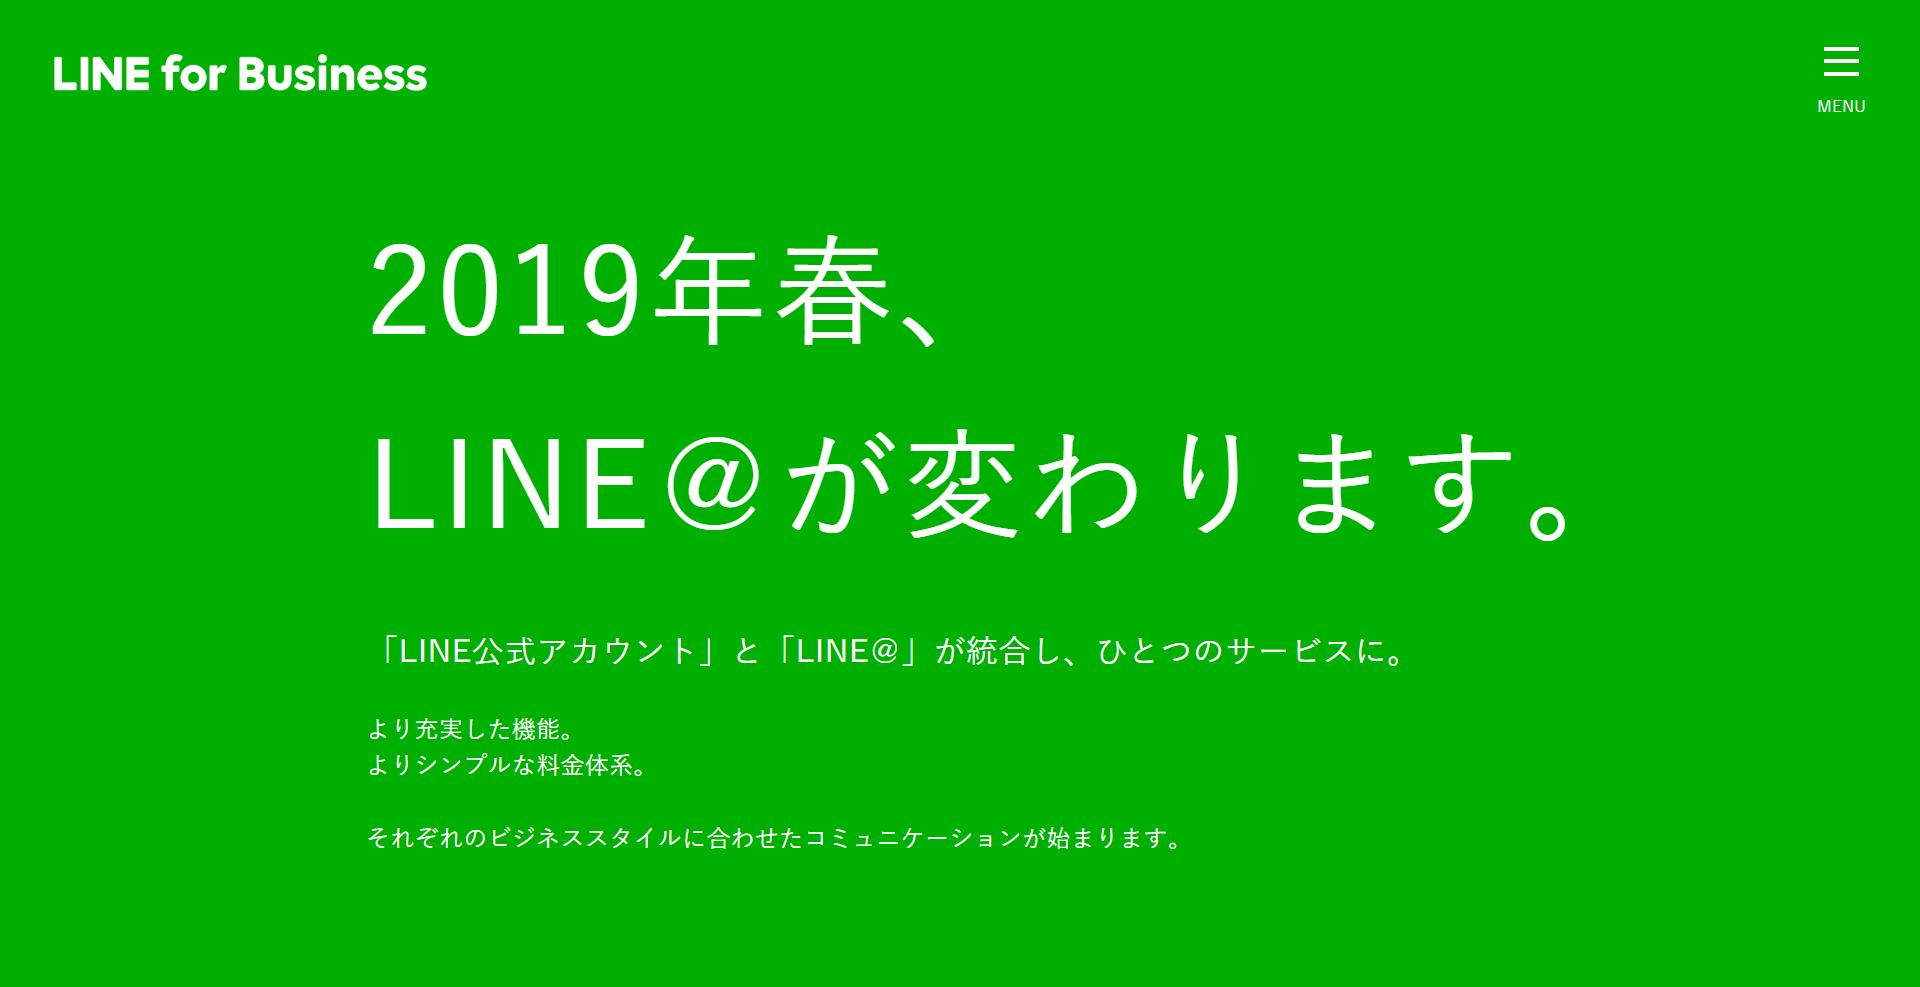 LINE for Businessサイトより「2019年春、LINE@が変わります」